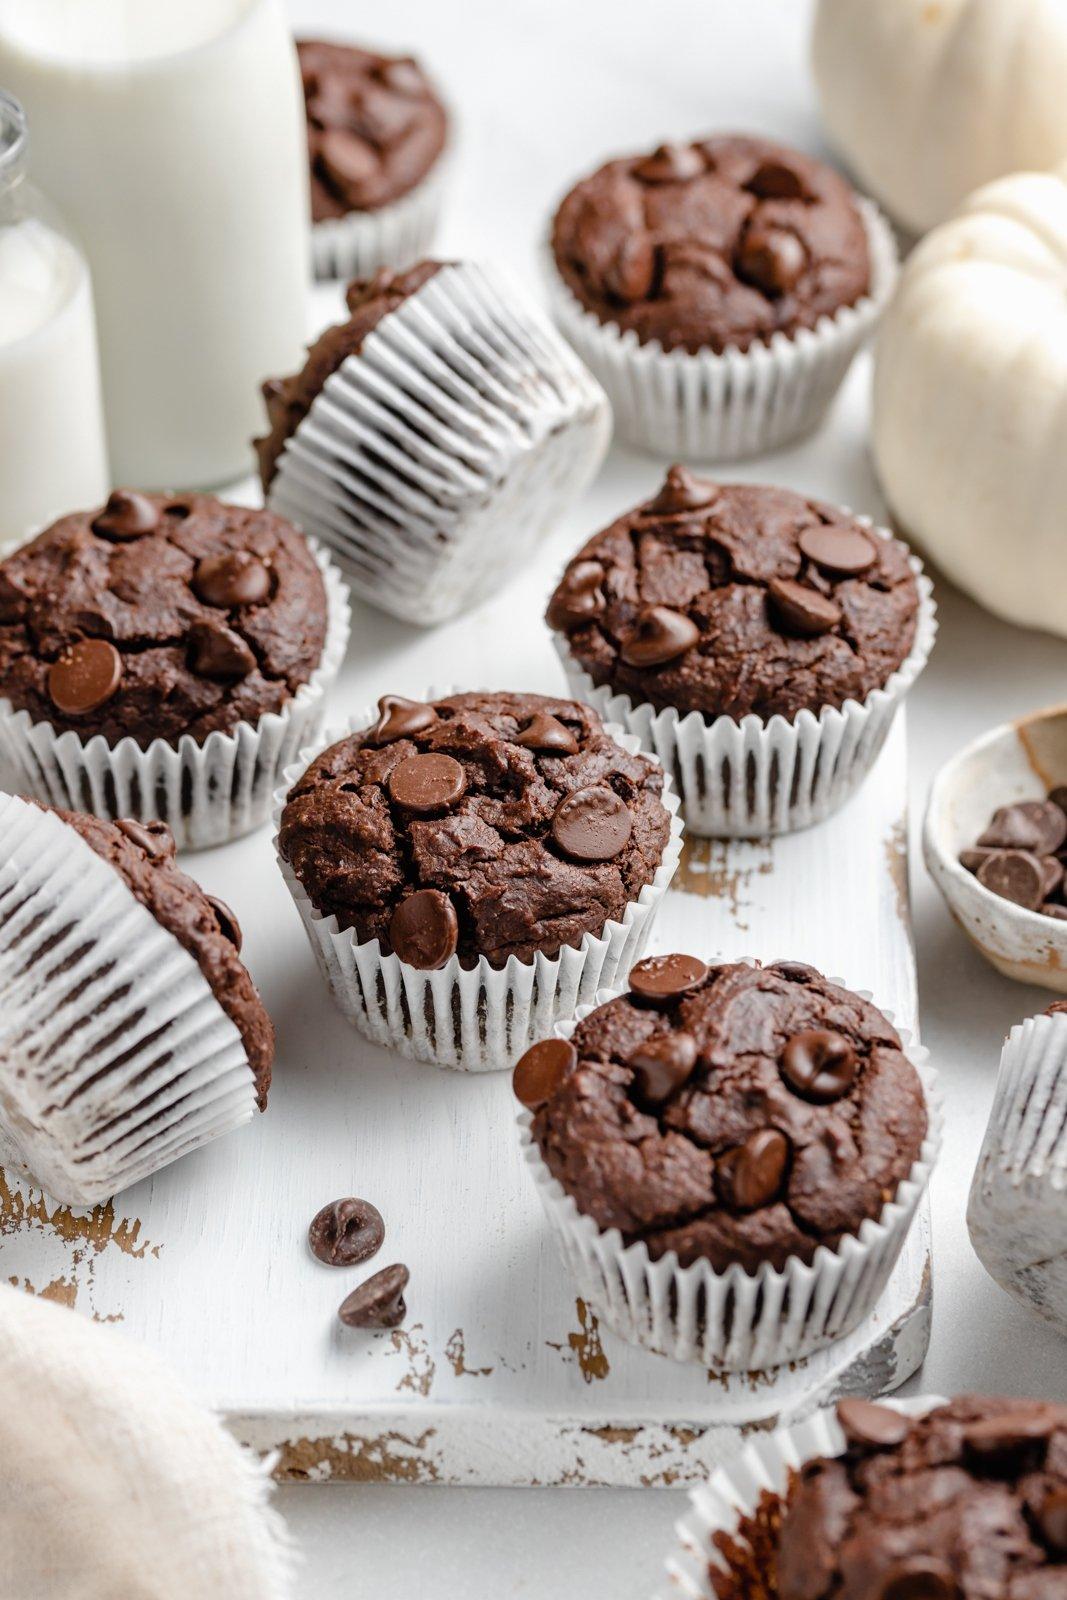 healthy chocolate pumpkin muffins on a board